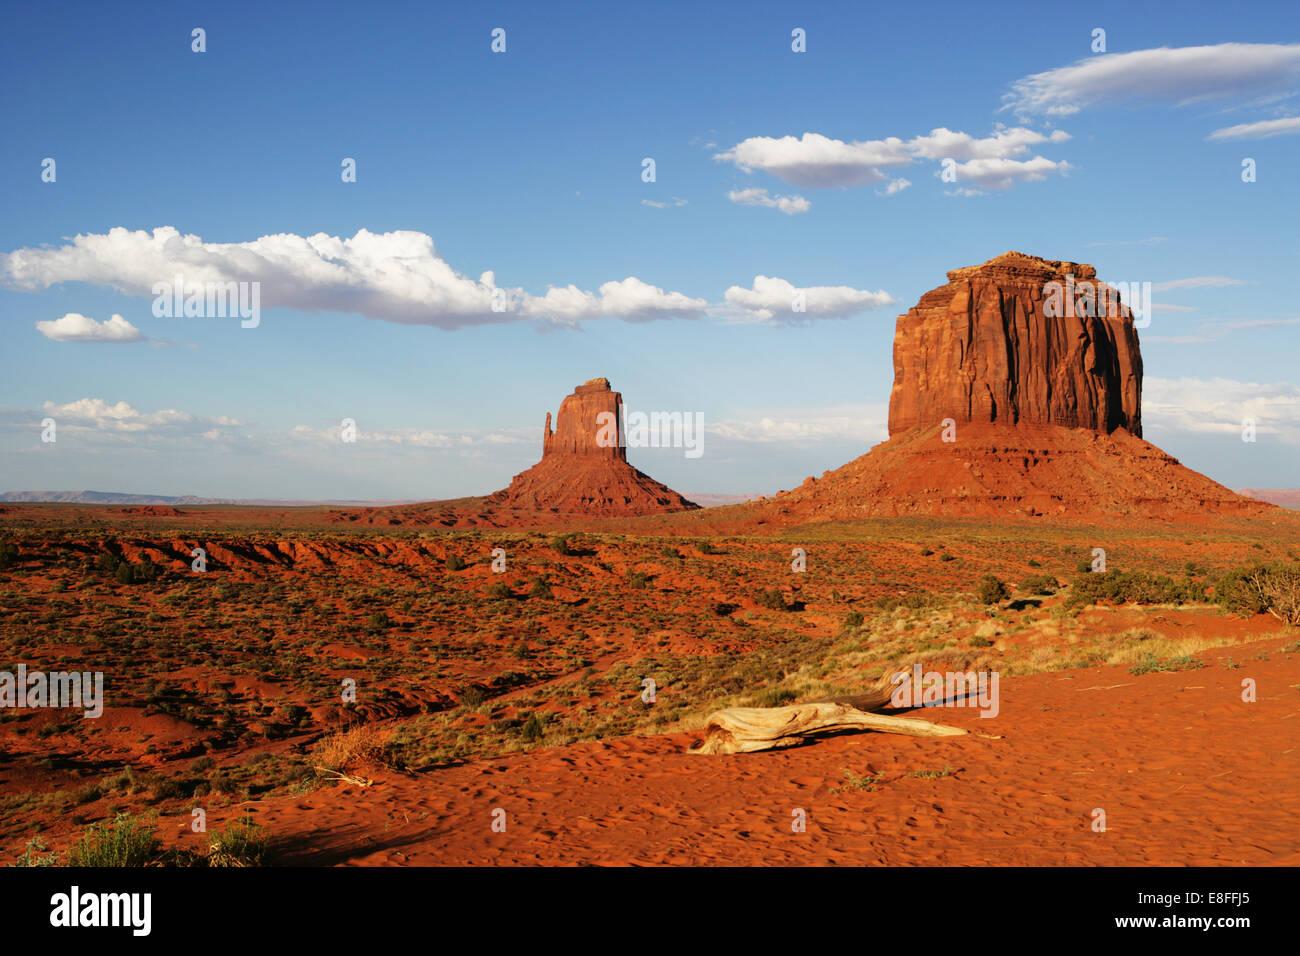 Monument Valley, Arizona, America, USA - Stock Image